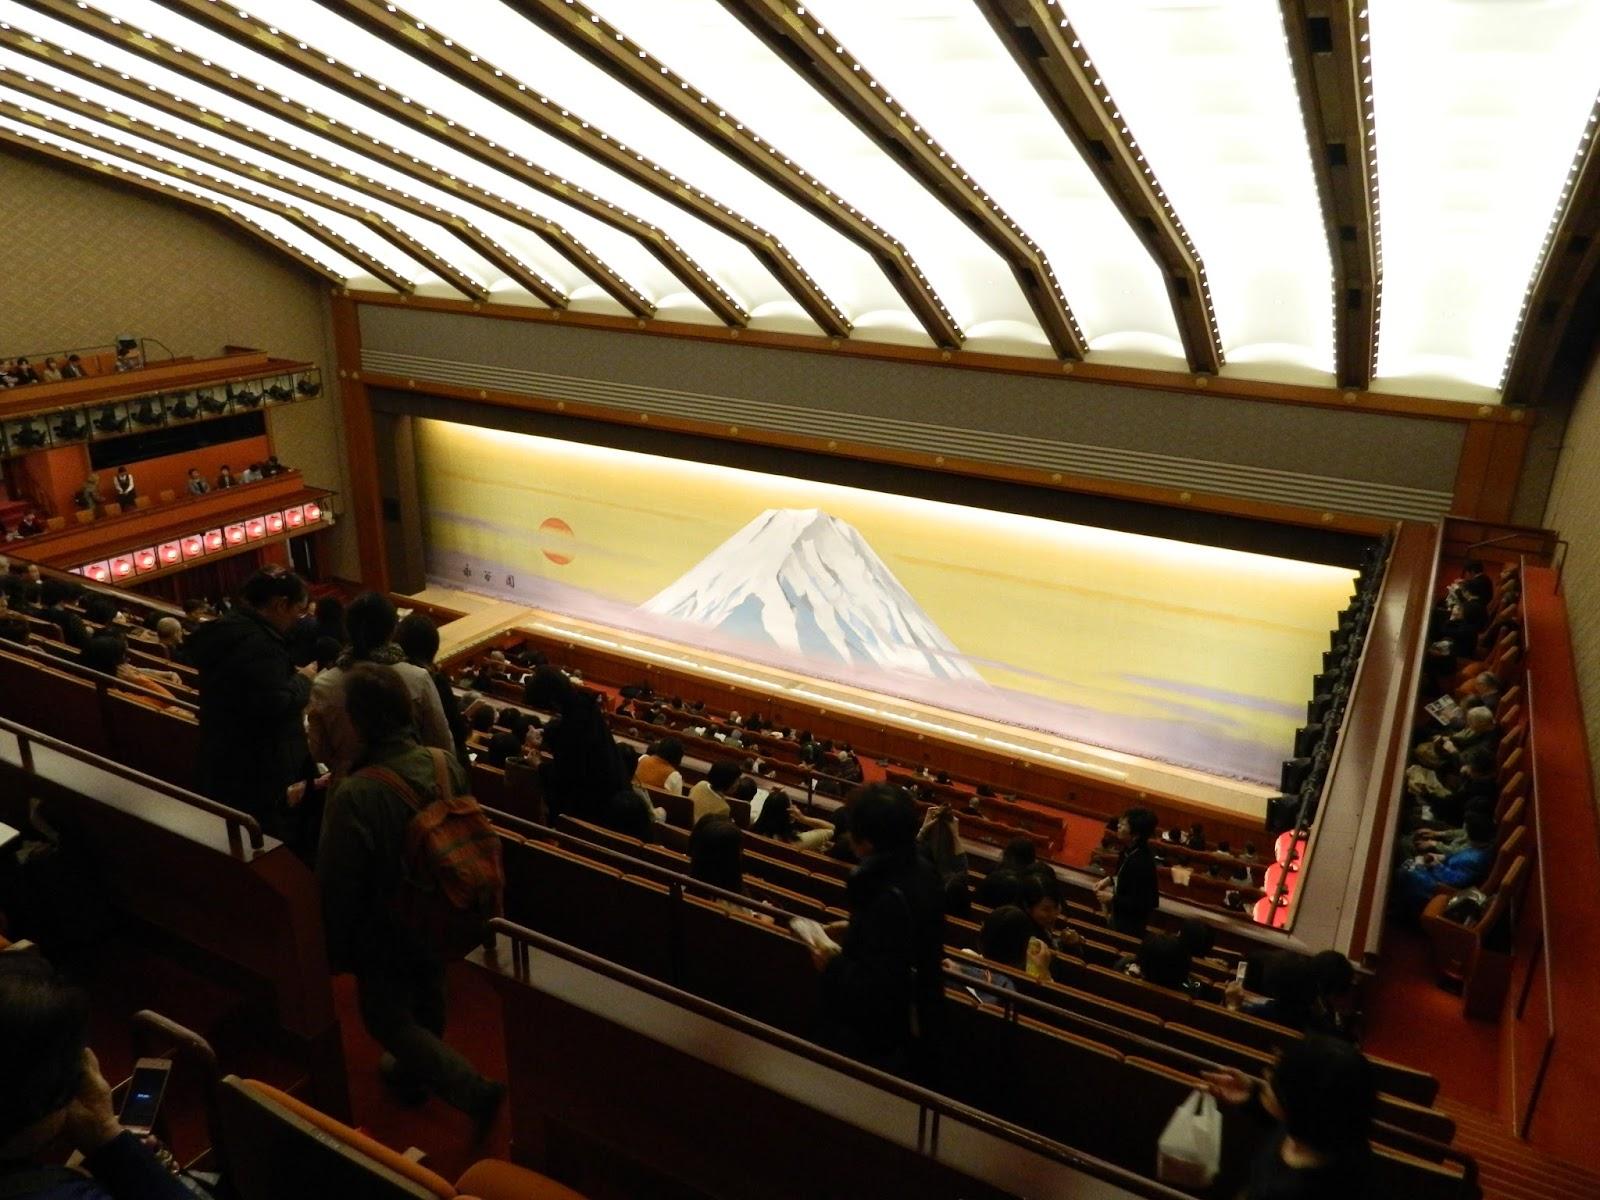 Nihon Fan: Visiting Kabuki-za Theater in Tokyo